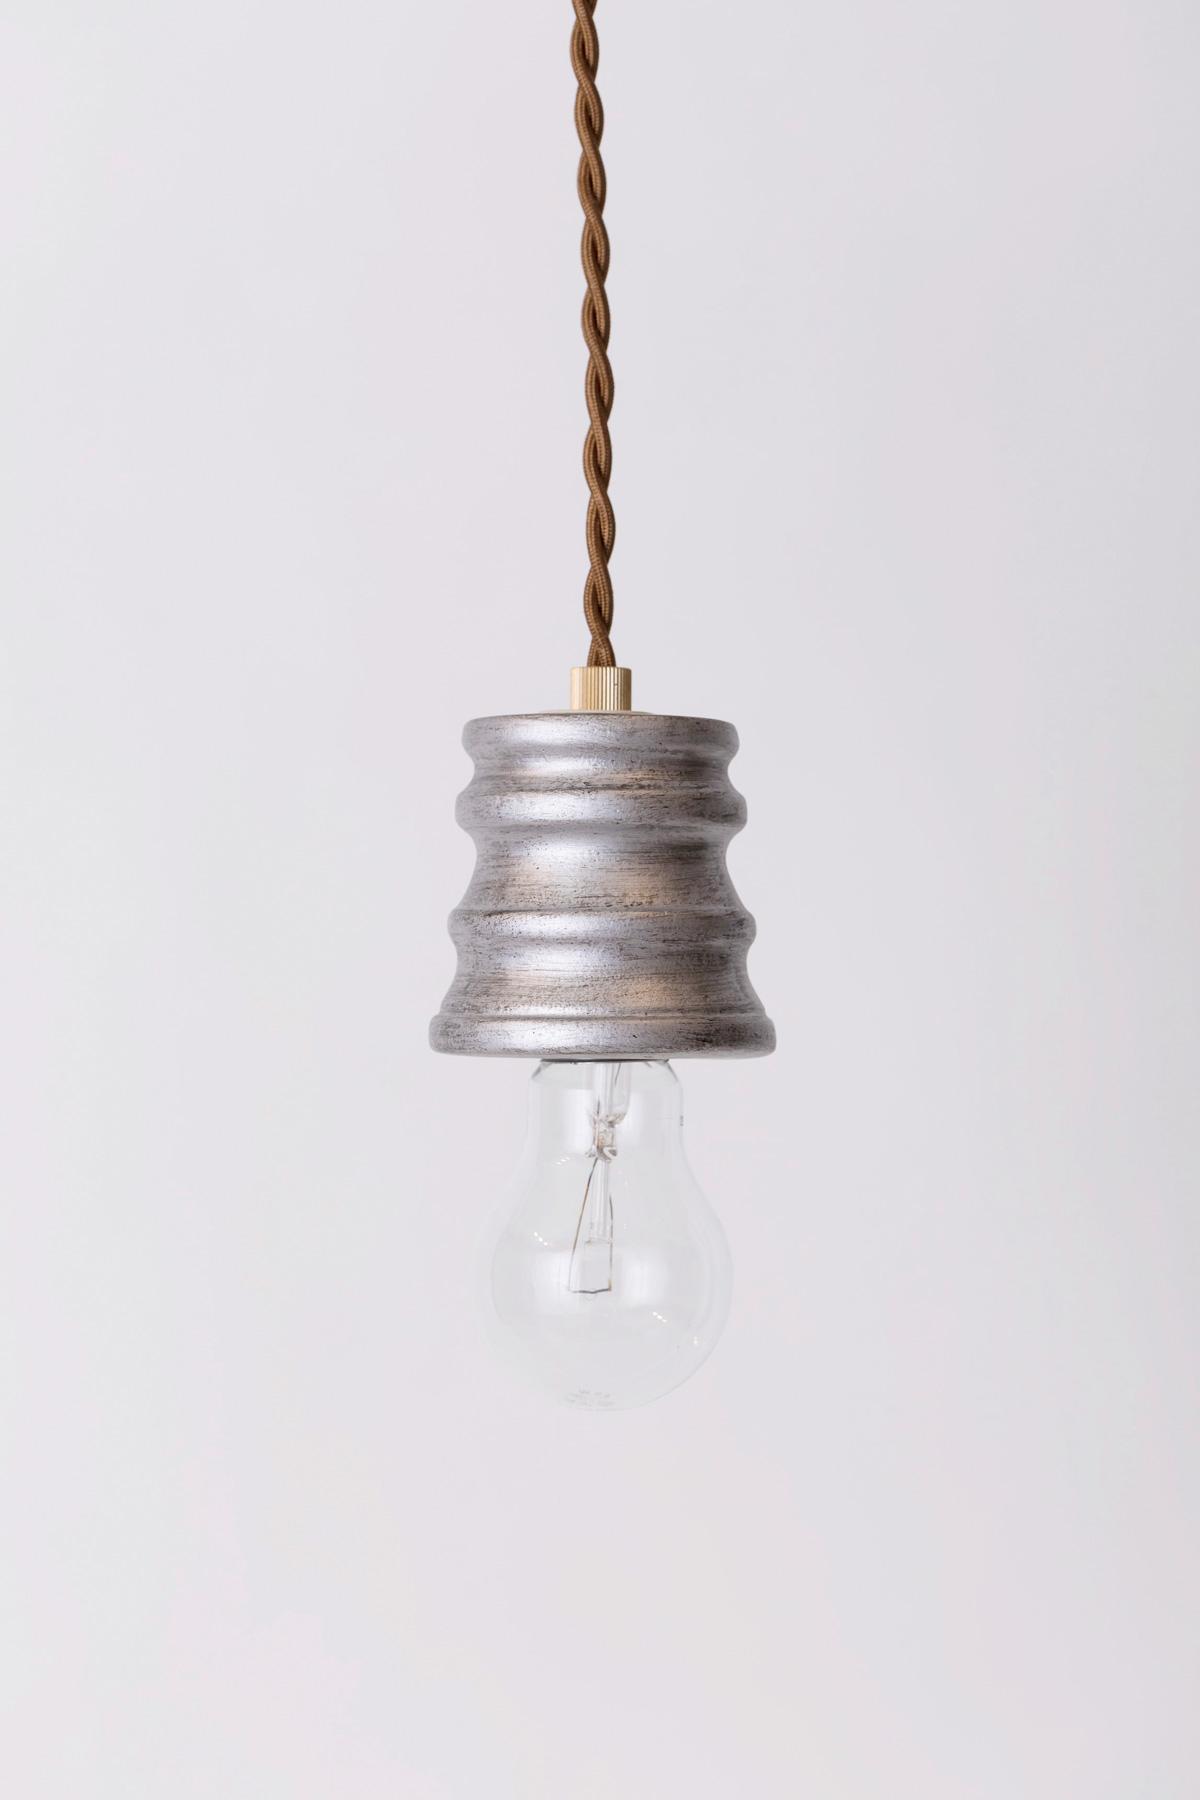 parthenon-silver-pendantのイメージ